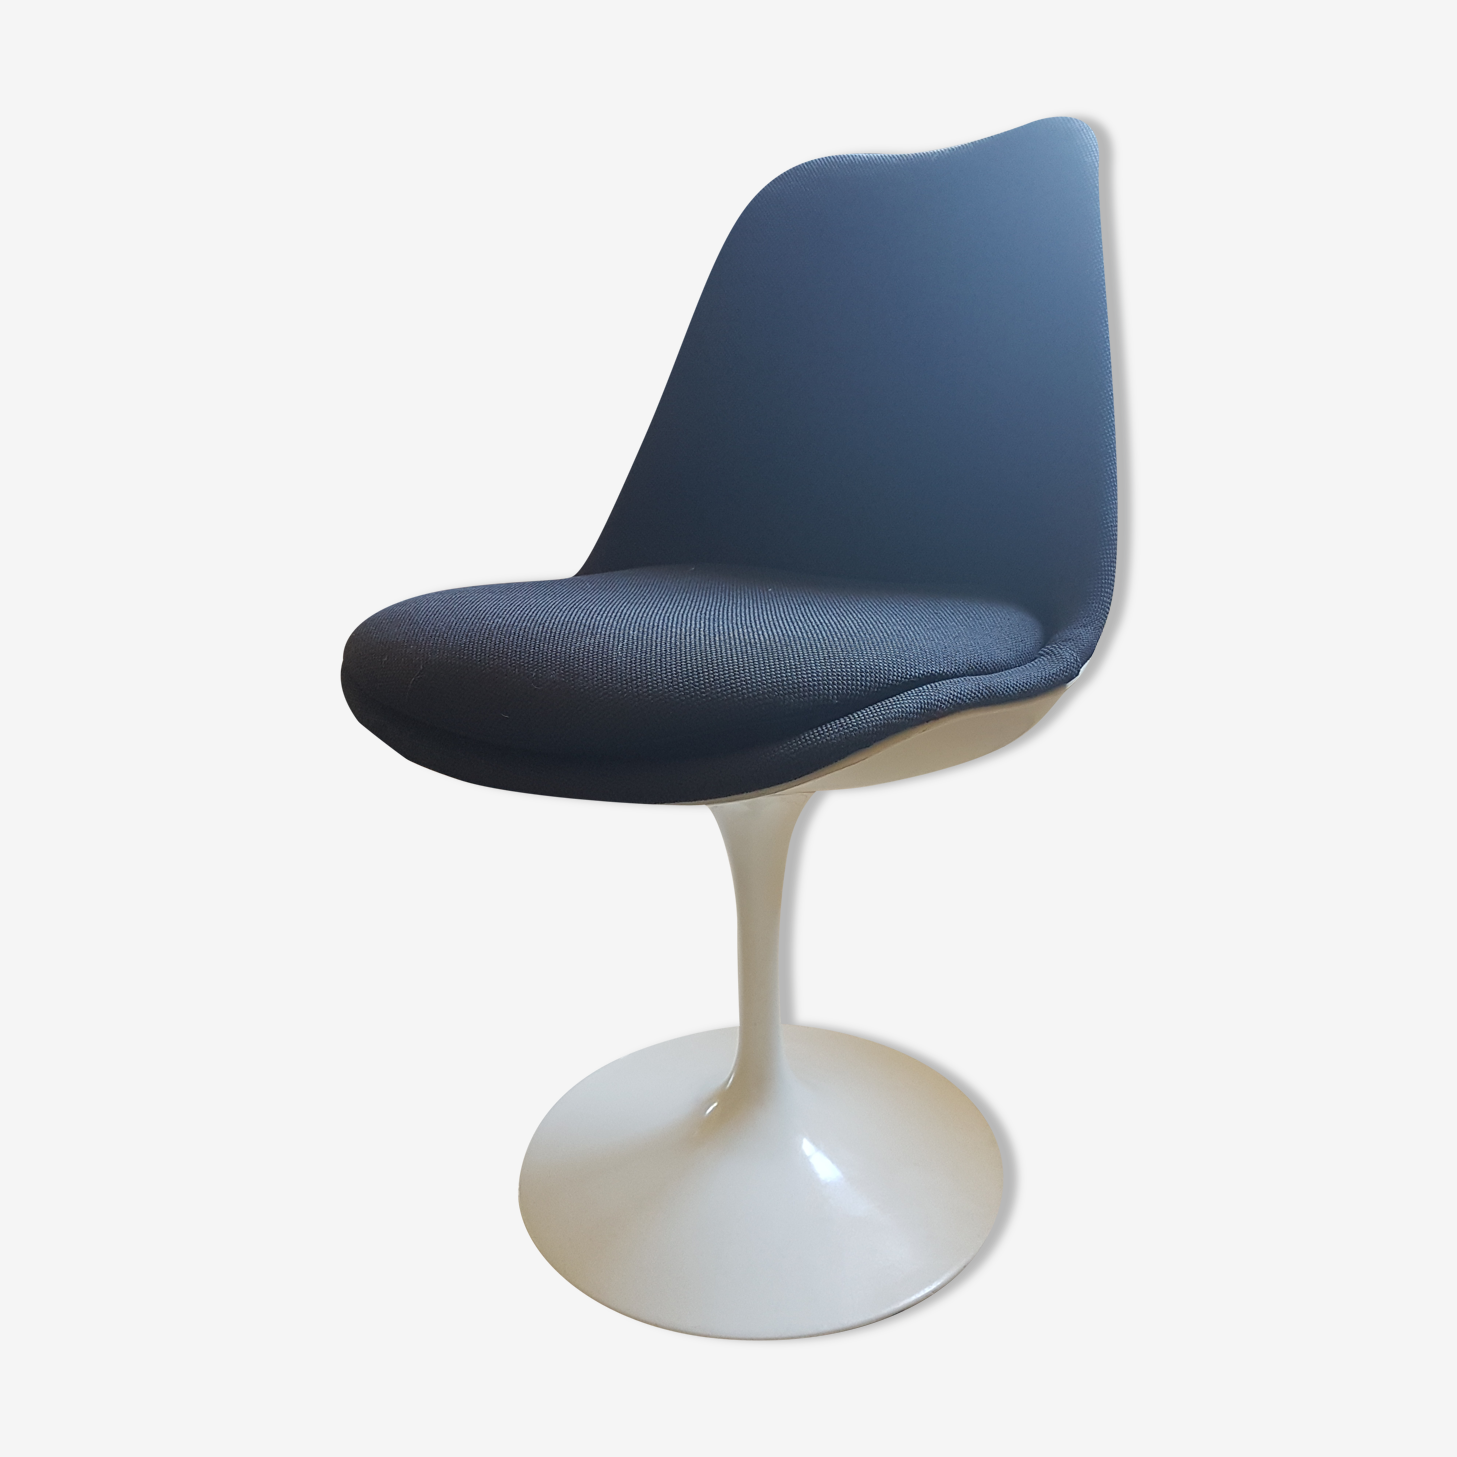 Swivel chair Saarinen for Knoll